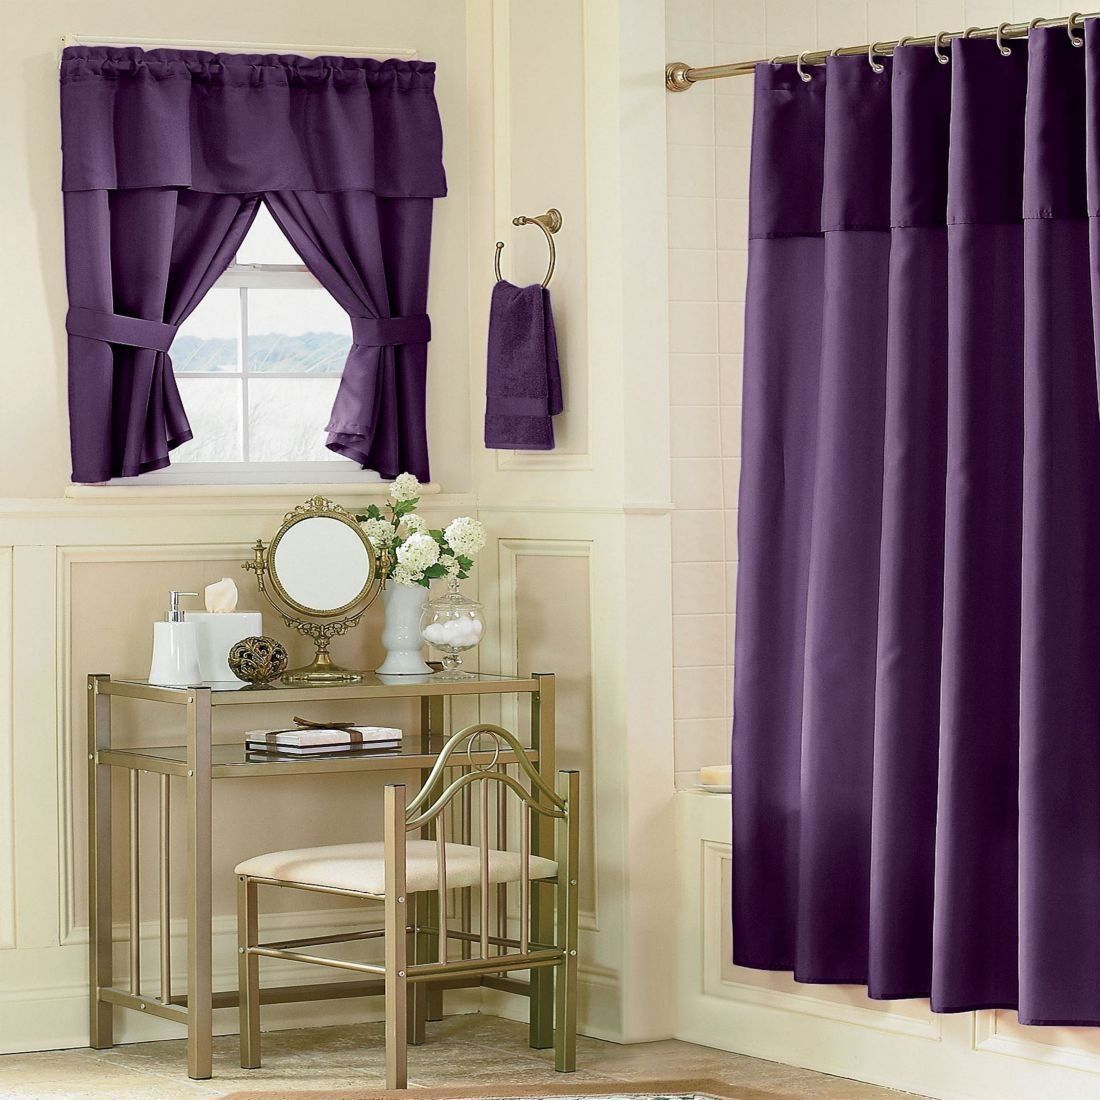 Bathroom Shower Curtains More Purple Shower Curtains On Amazon Dark Purple Bathroom Purple Bathrooms Purple Bathroom Decor